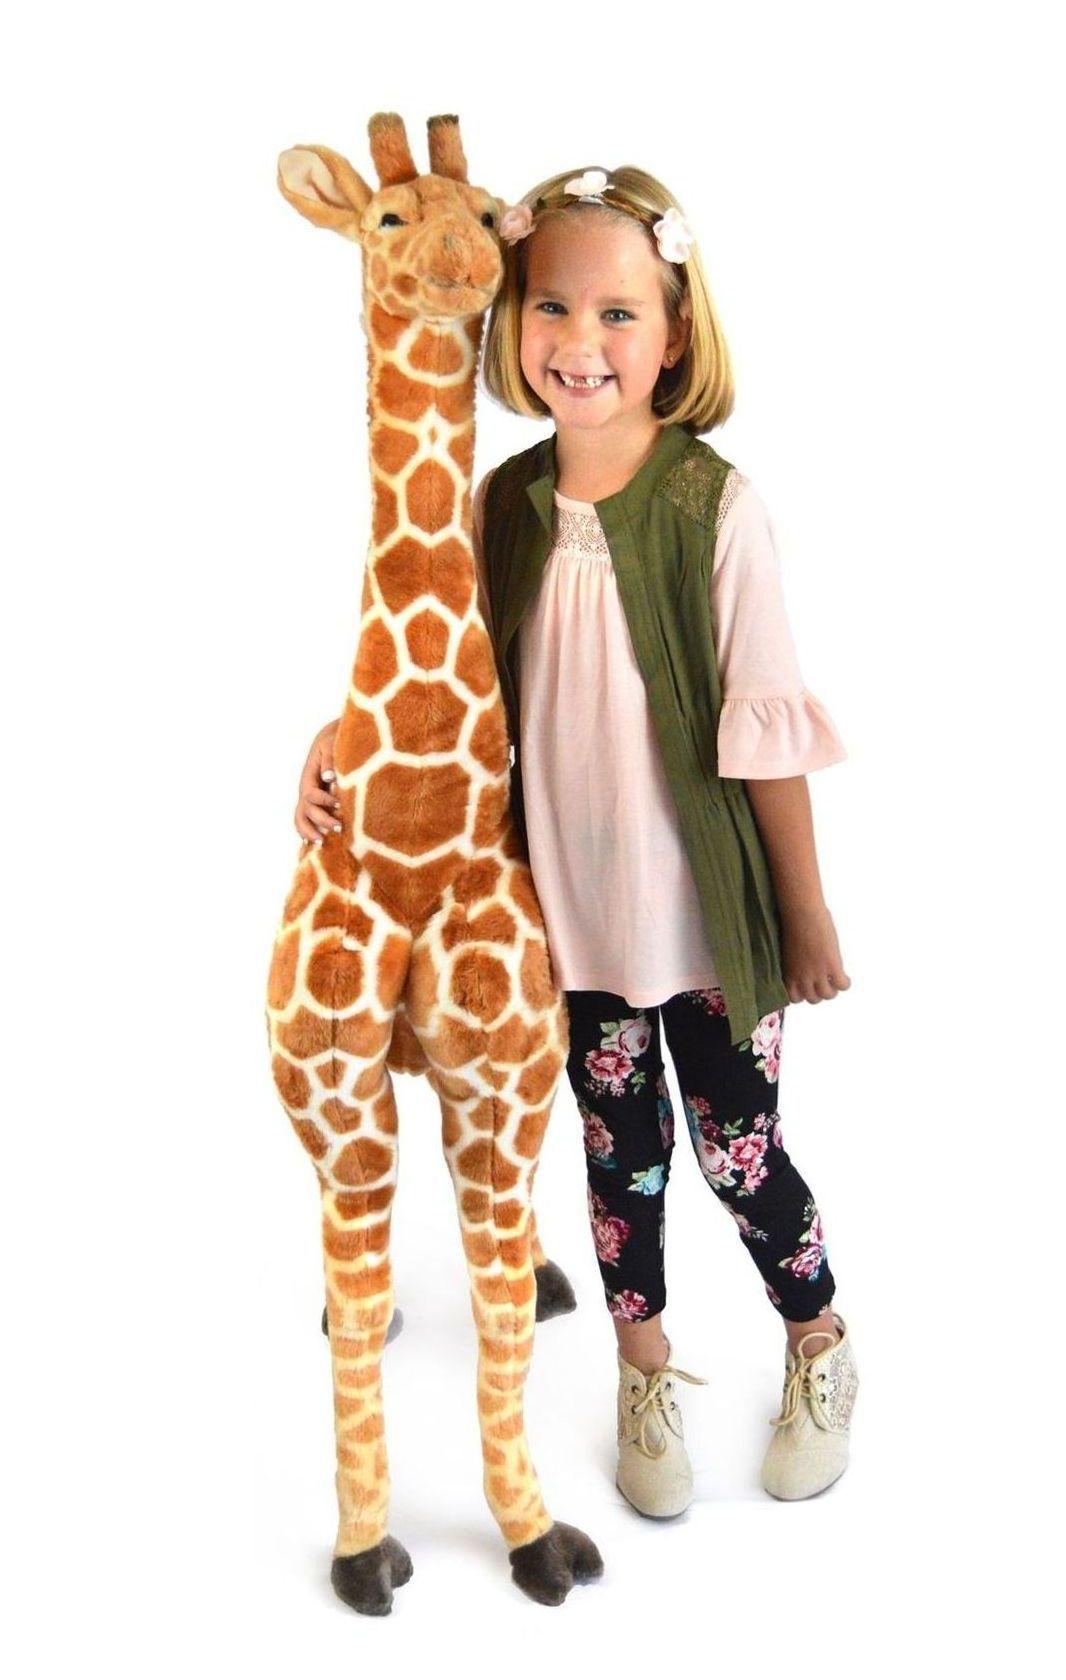 Giant Giraffe Stuffed Animal Plush Toy Giraffe Stuffed Animal Giant Giraffe Stuffed Animal Giant Stuffed Animals [ 1680 x 1066 Pixel ]